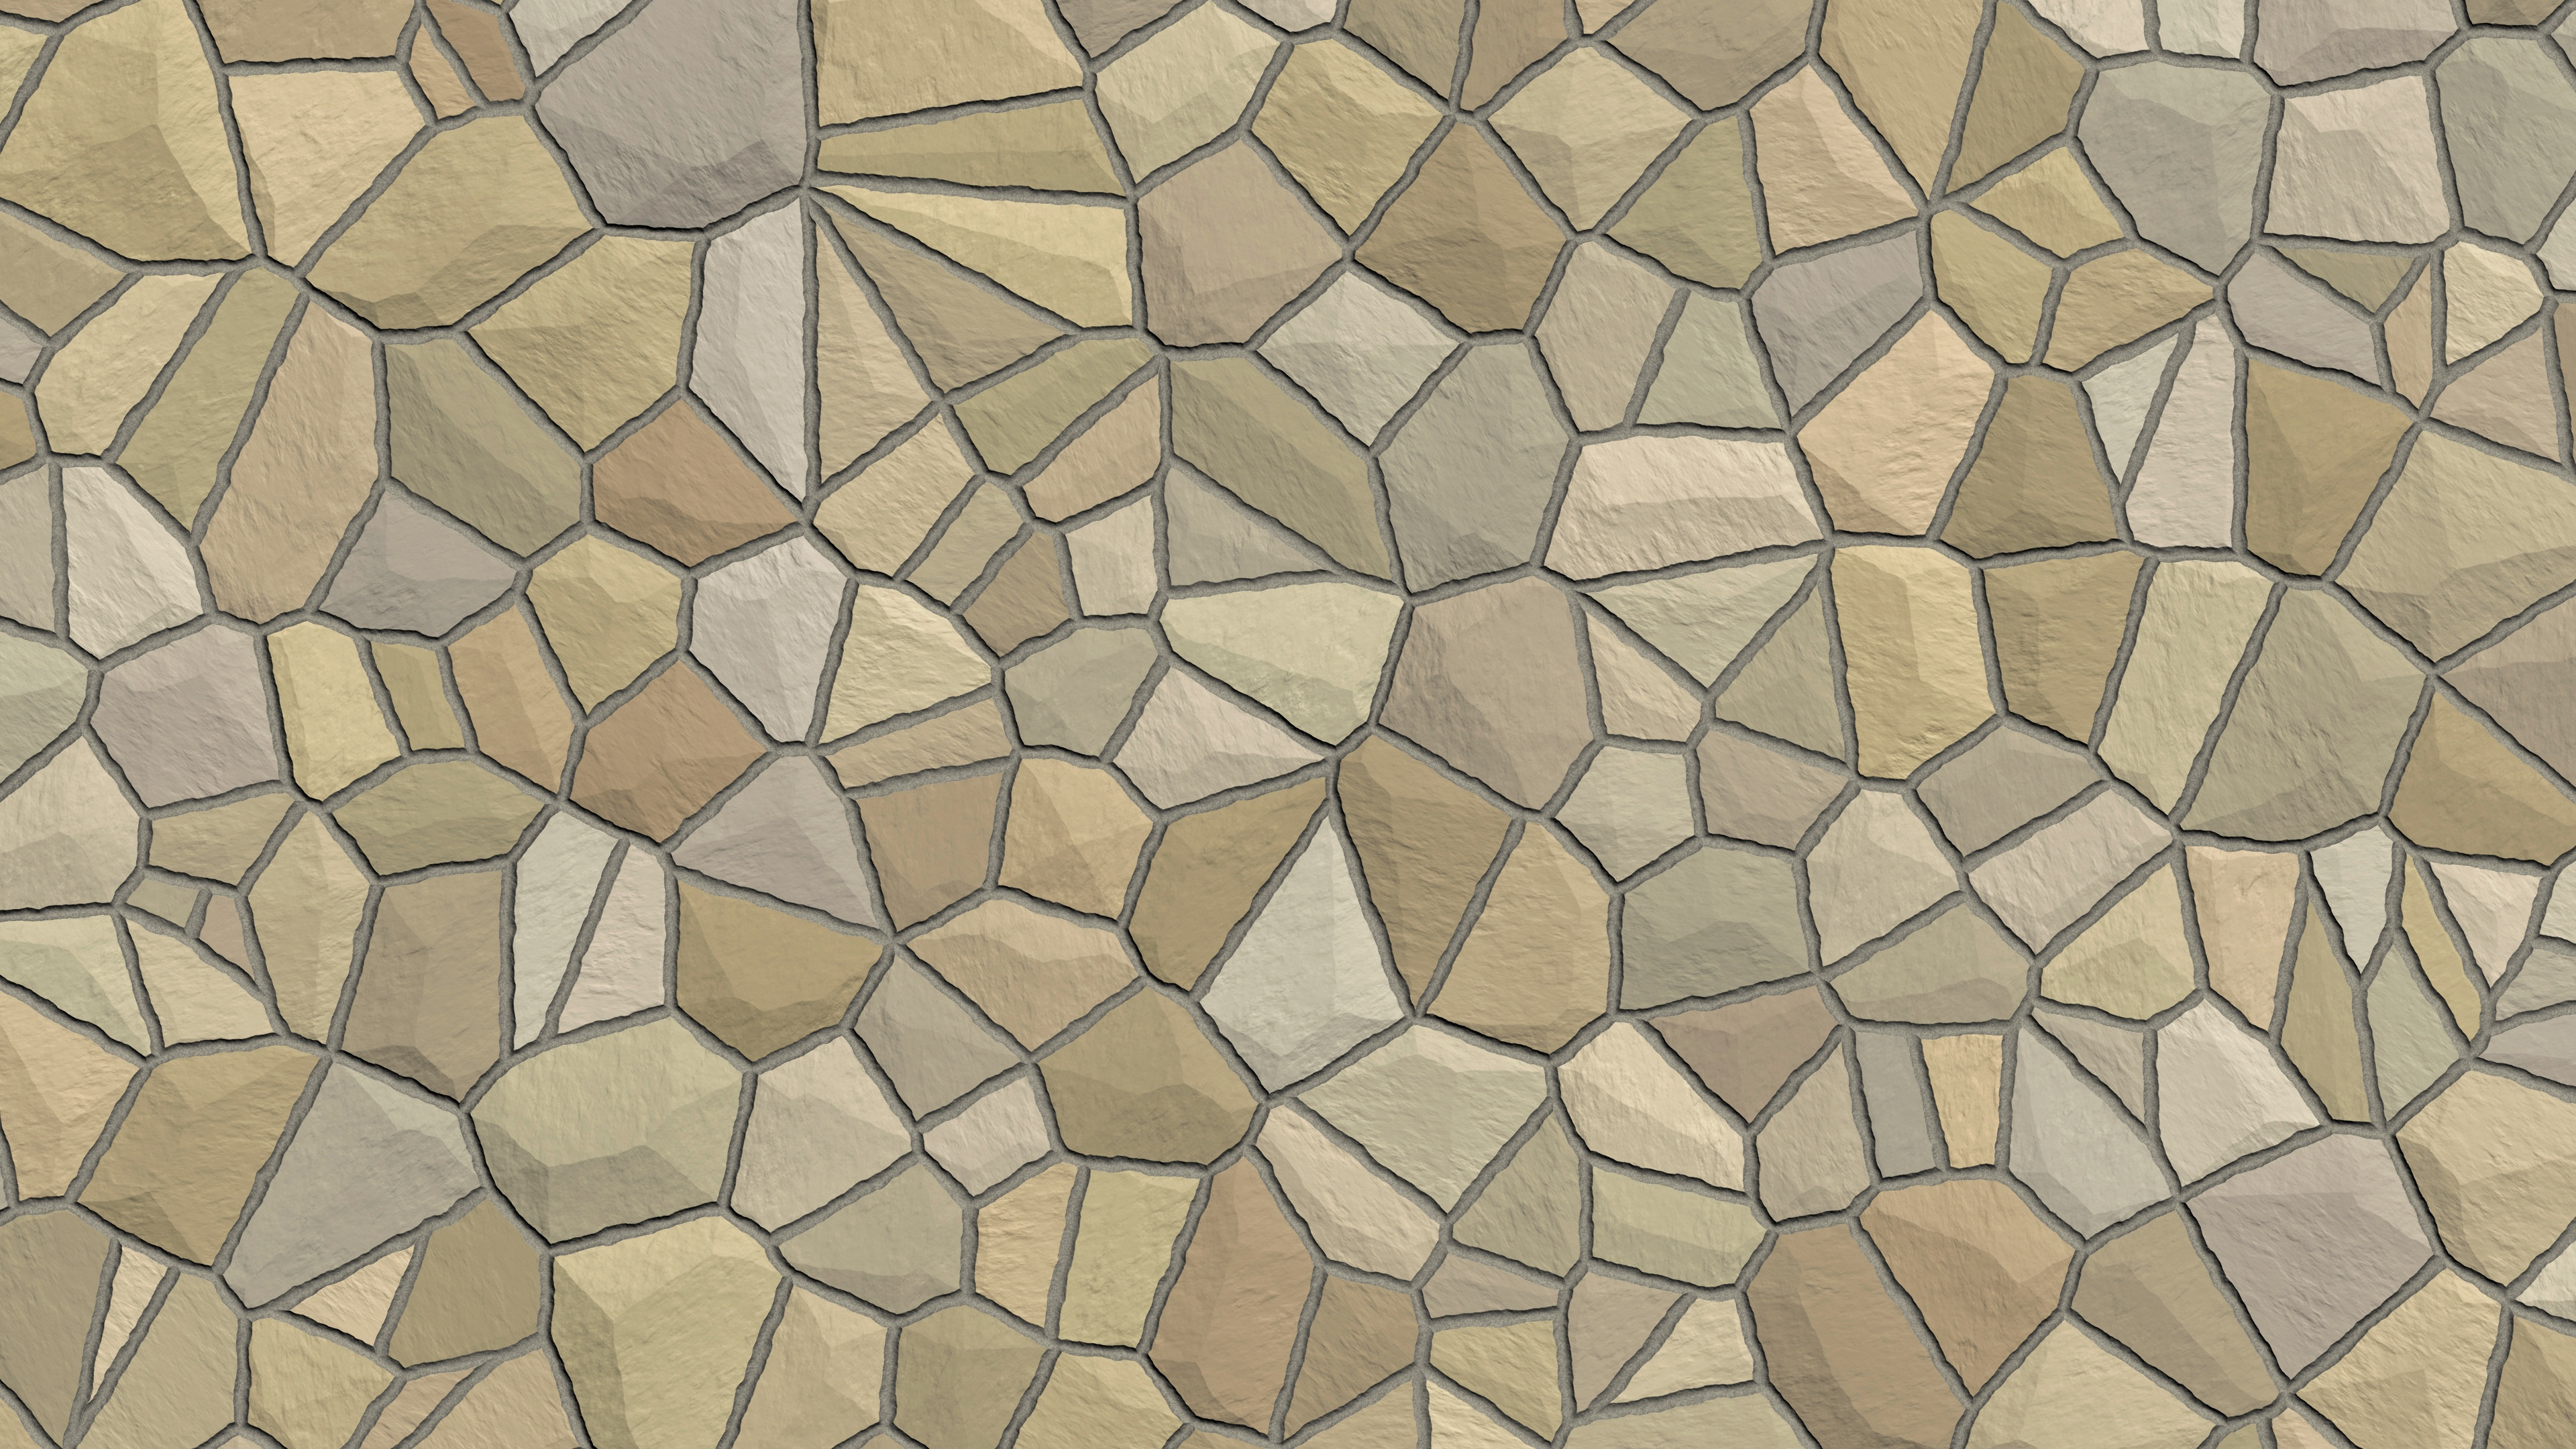 Brown And Cream Mosaic Tile Wallpaper 4k Ultra Hd Wallpaper